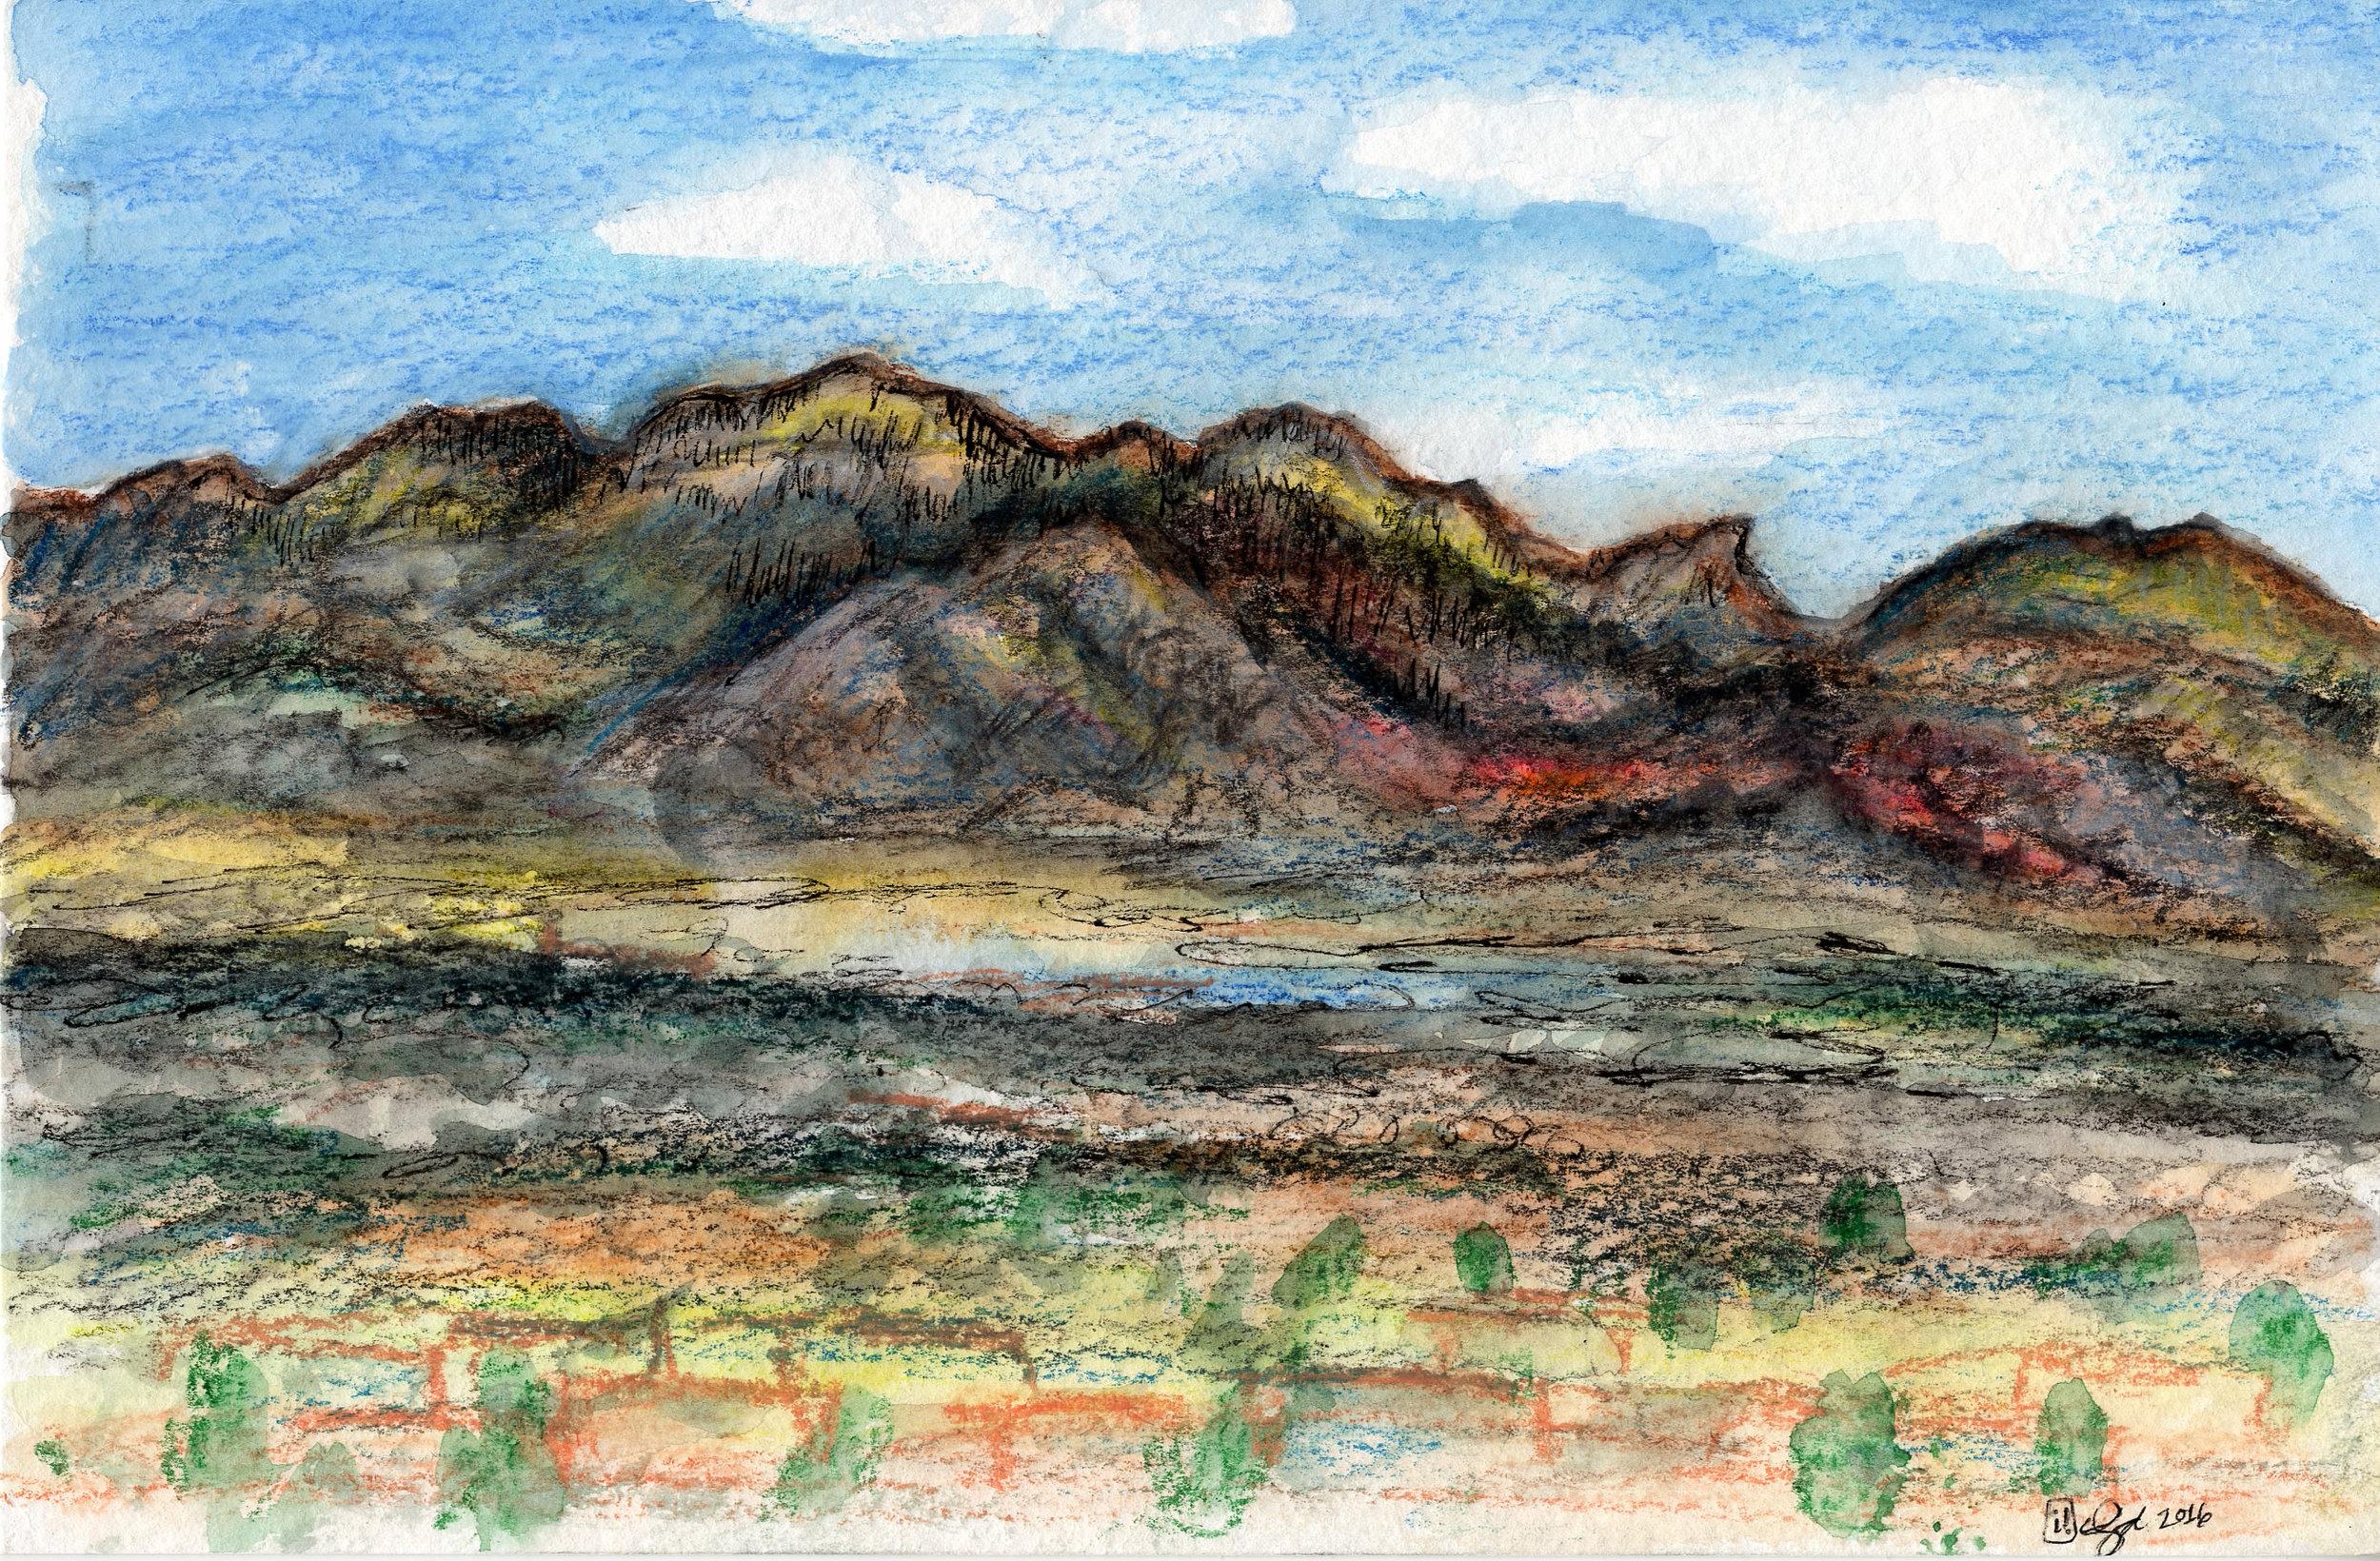 2016-Las-Vegas-Watercolor-Crayon-Painting.JPG